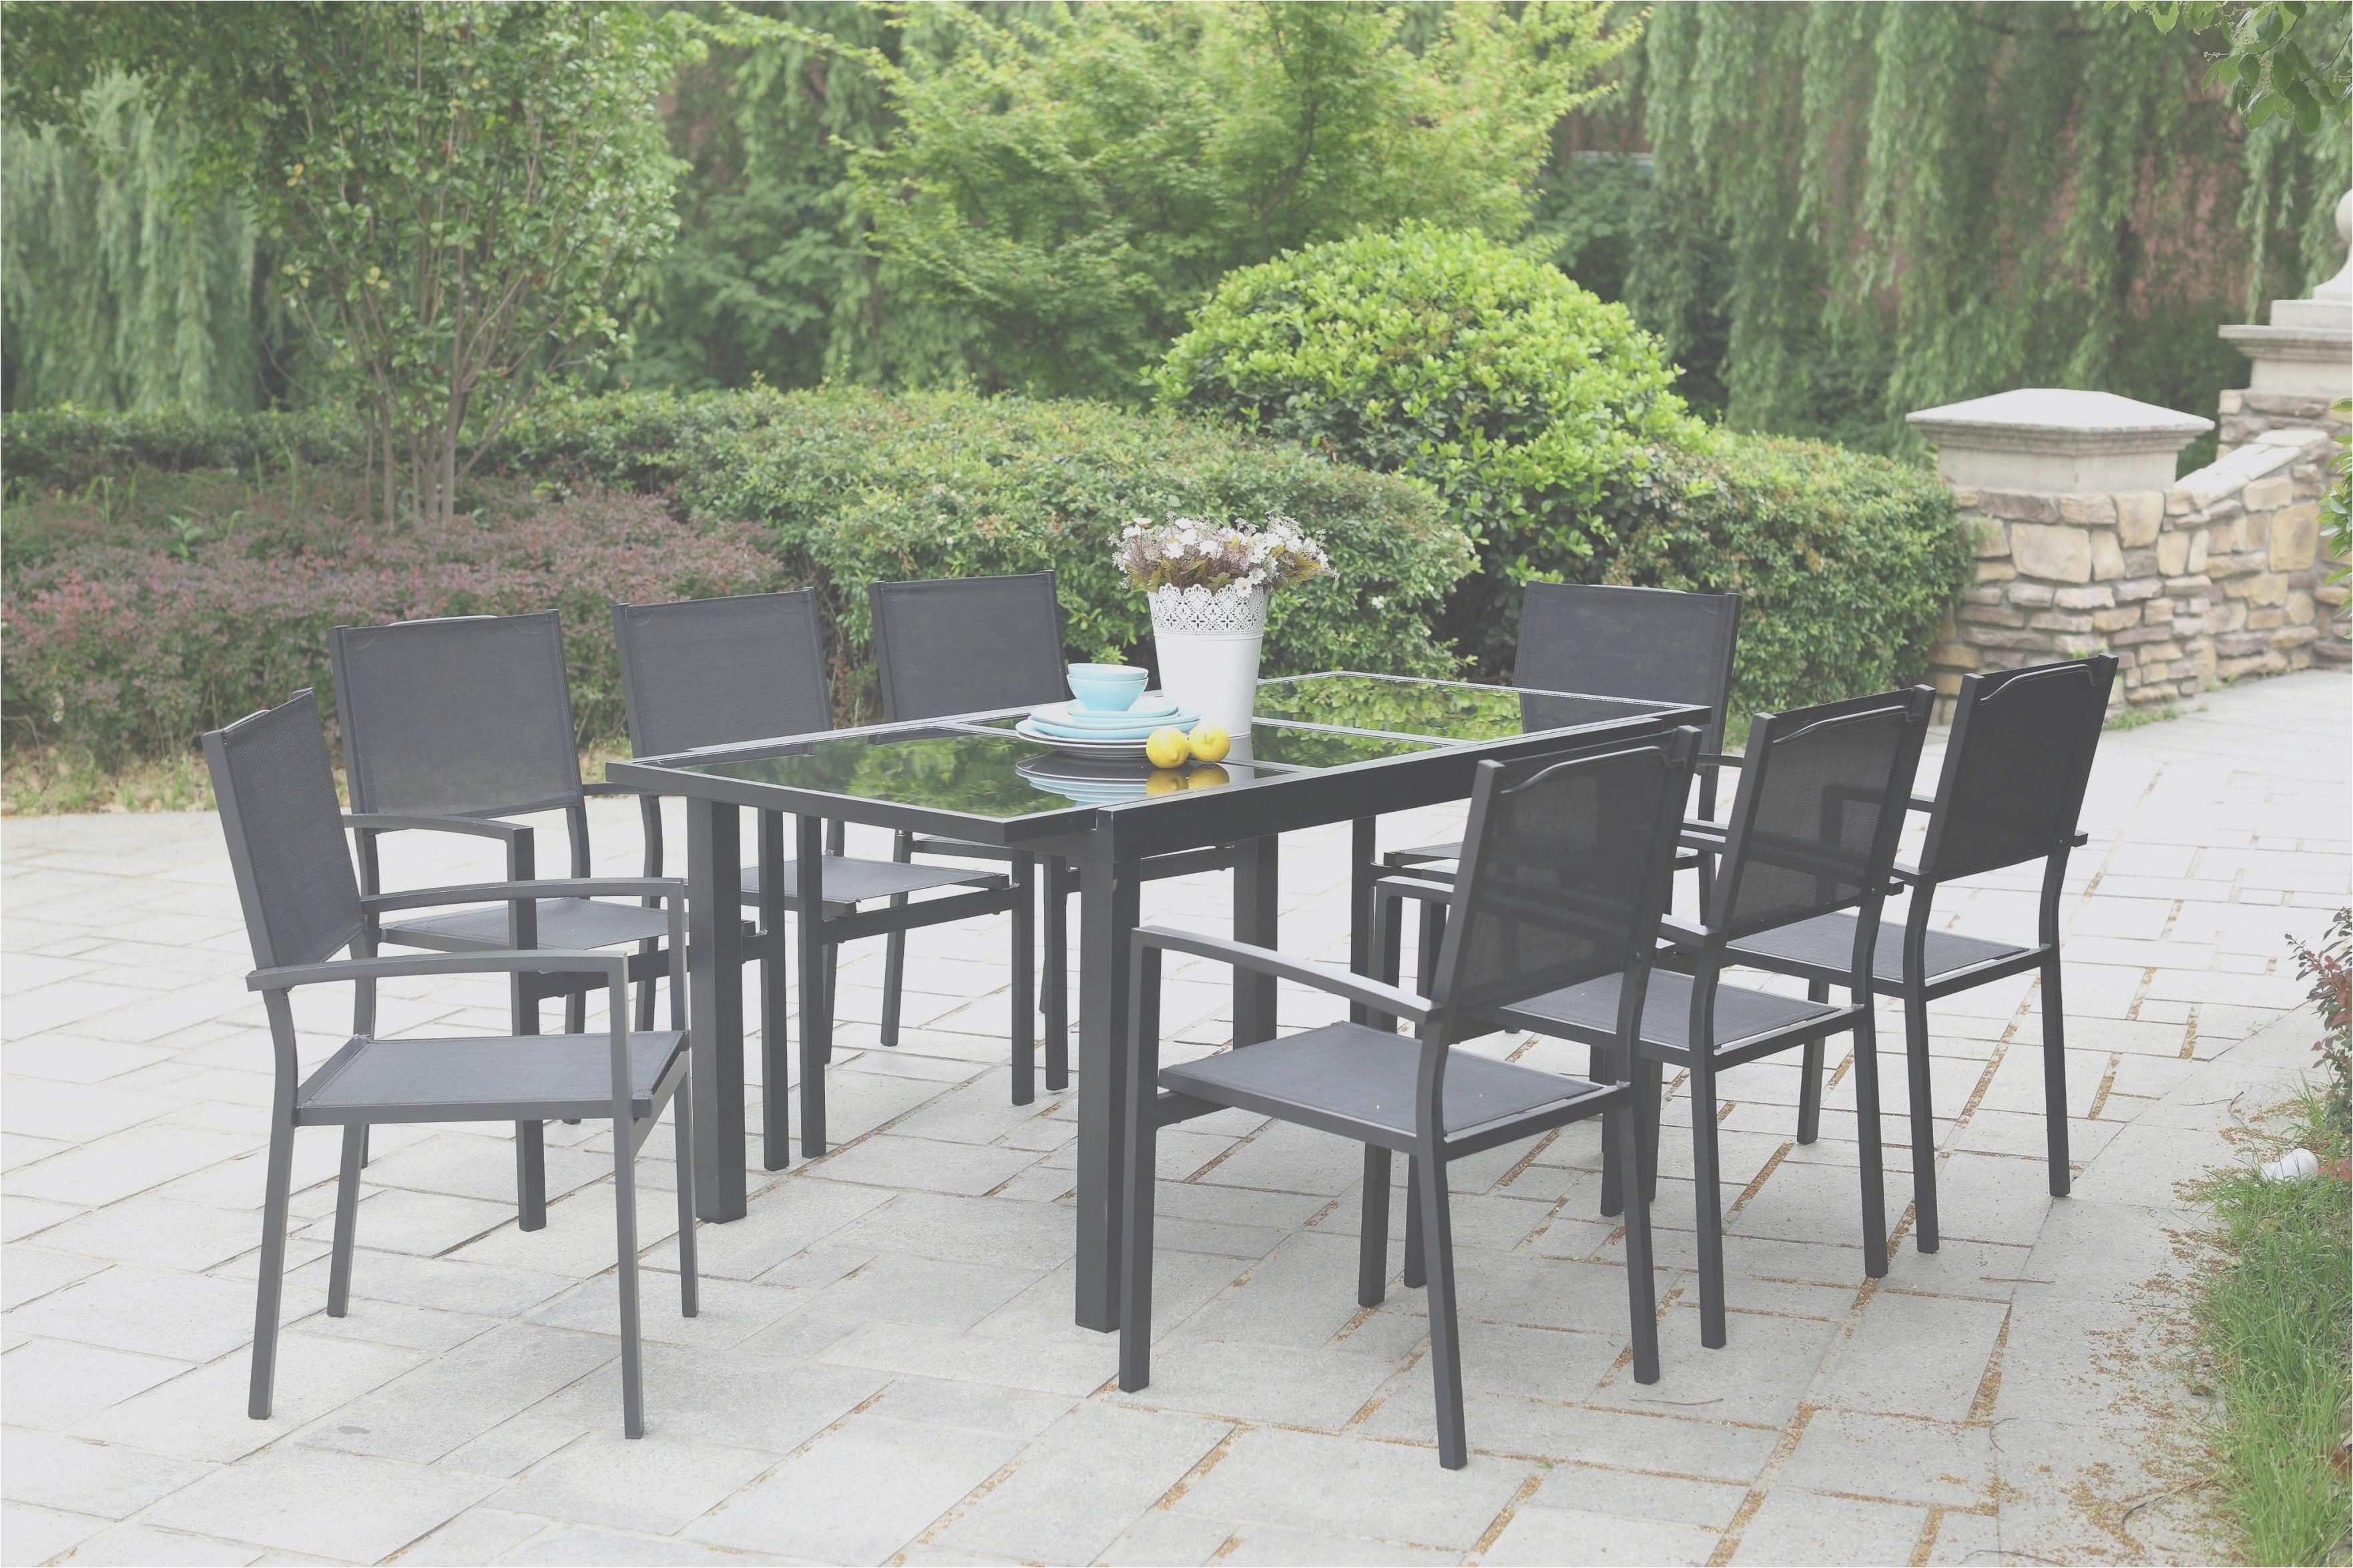 Meuble De Jardin Gifi Impressionnant Image Salon De Jardin Pour Balcon Avec Incroyable Admiré Table De Jardin